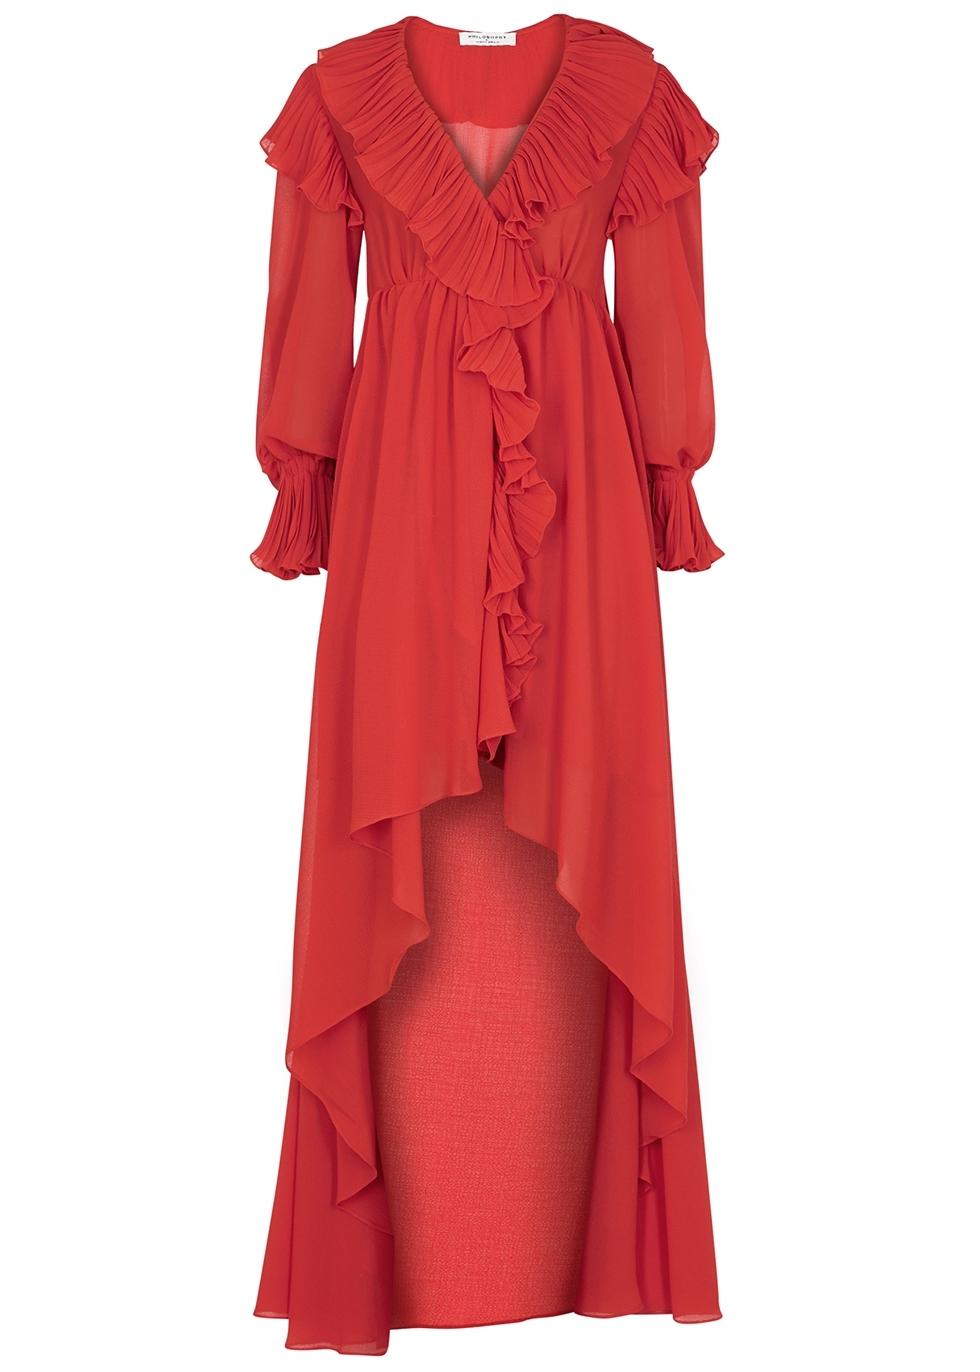 b0c6fdc58833 Designer Dresses   Designer Gowns - Harvey Nichols